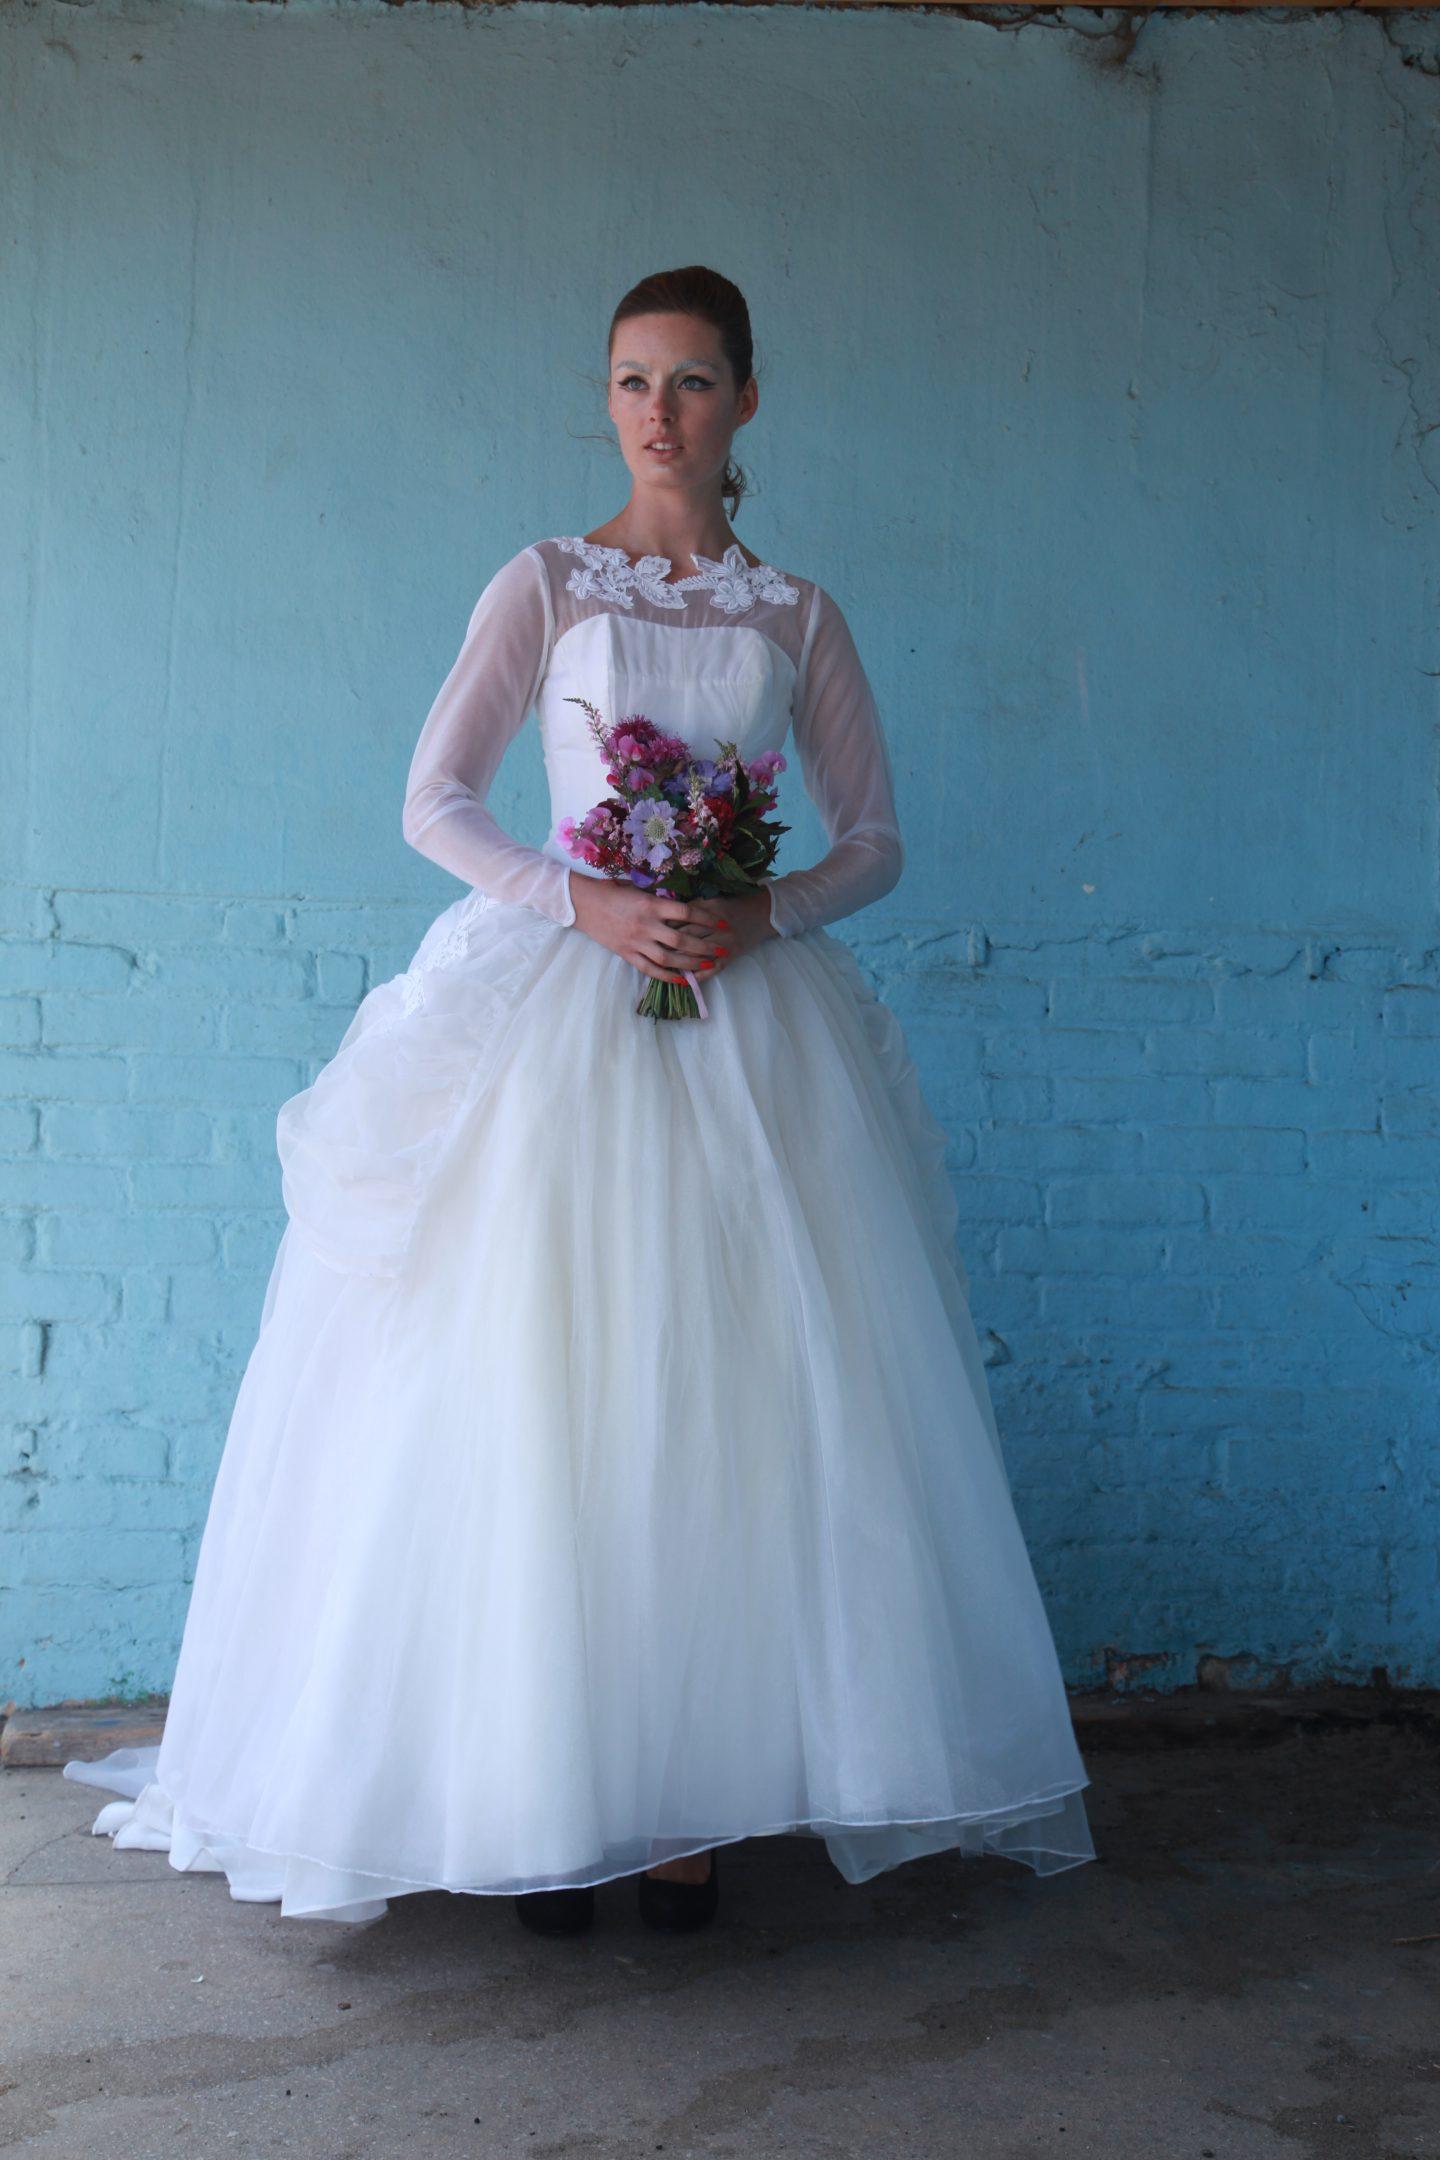 Magnificent Princess Kates Wedding Dress Gallery - Wedding Ideas ...